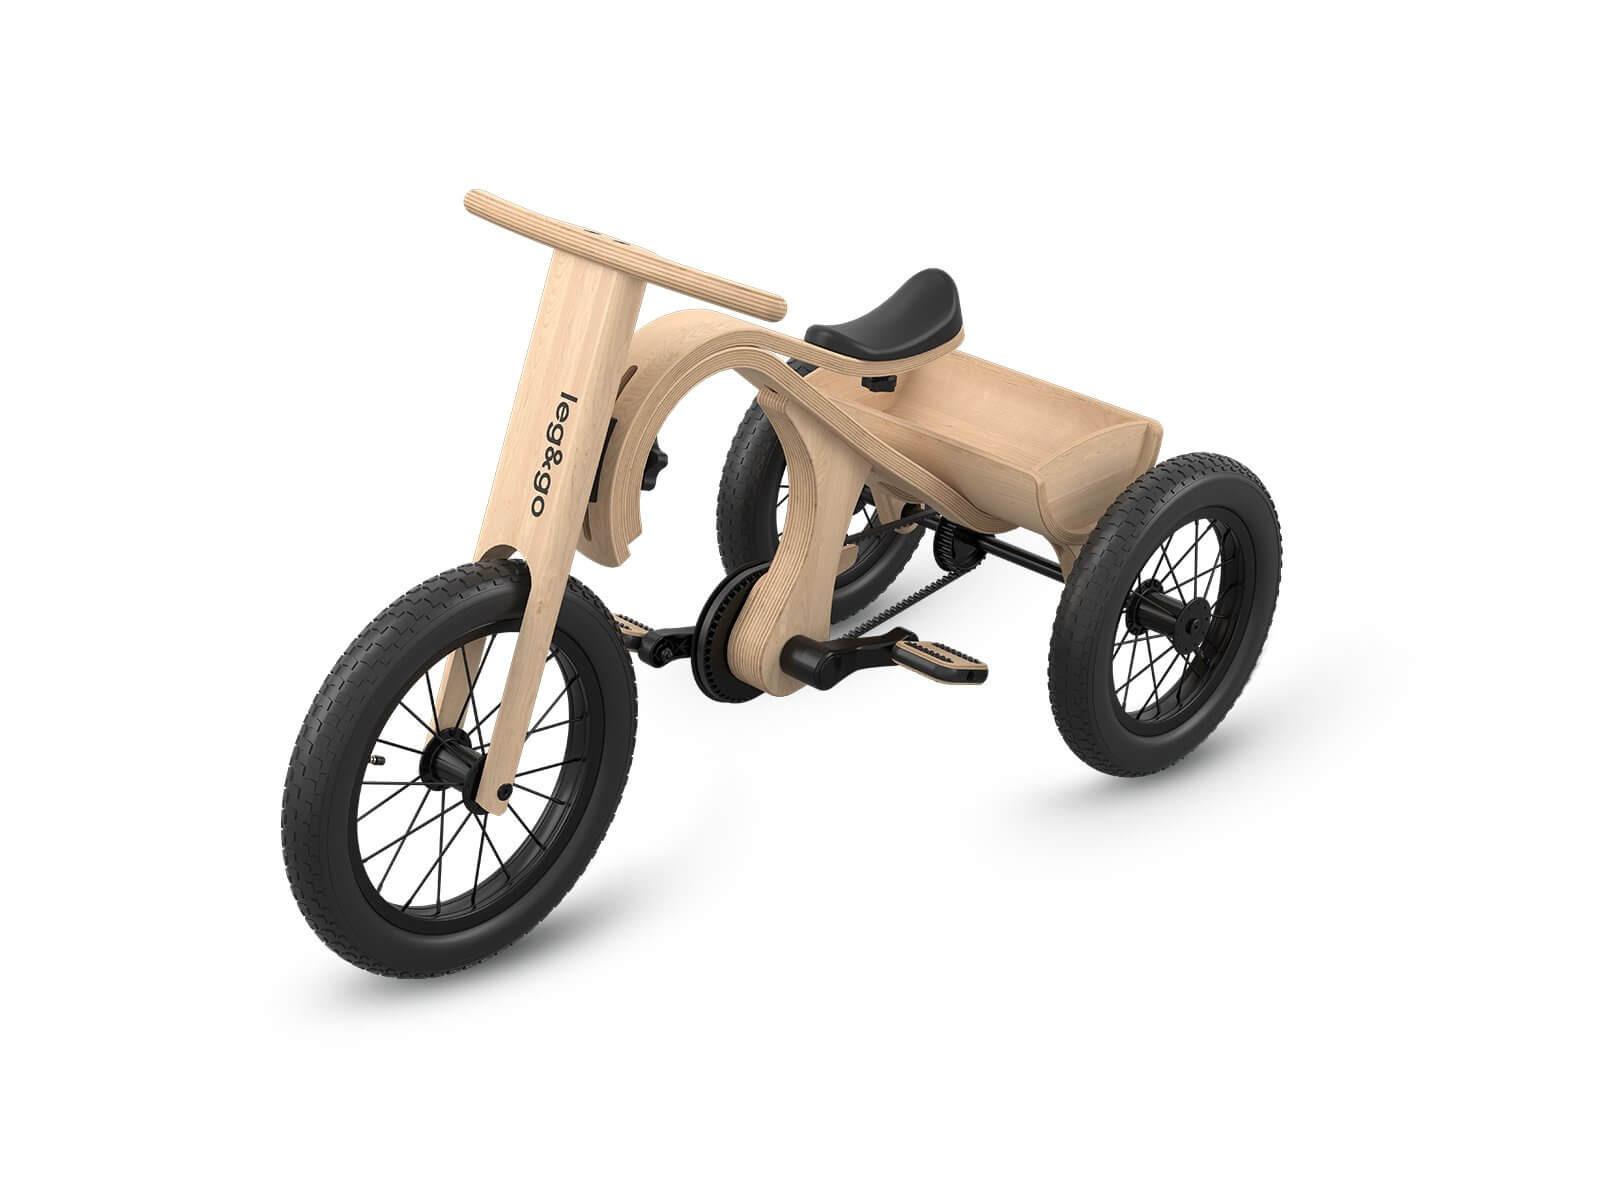 Leg&Go TriCycle - Das Dreirad